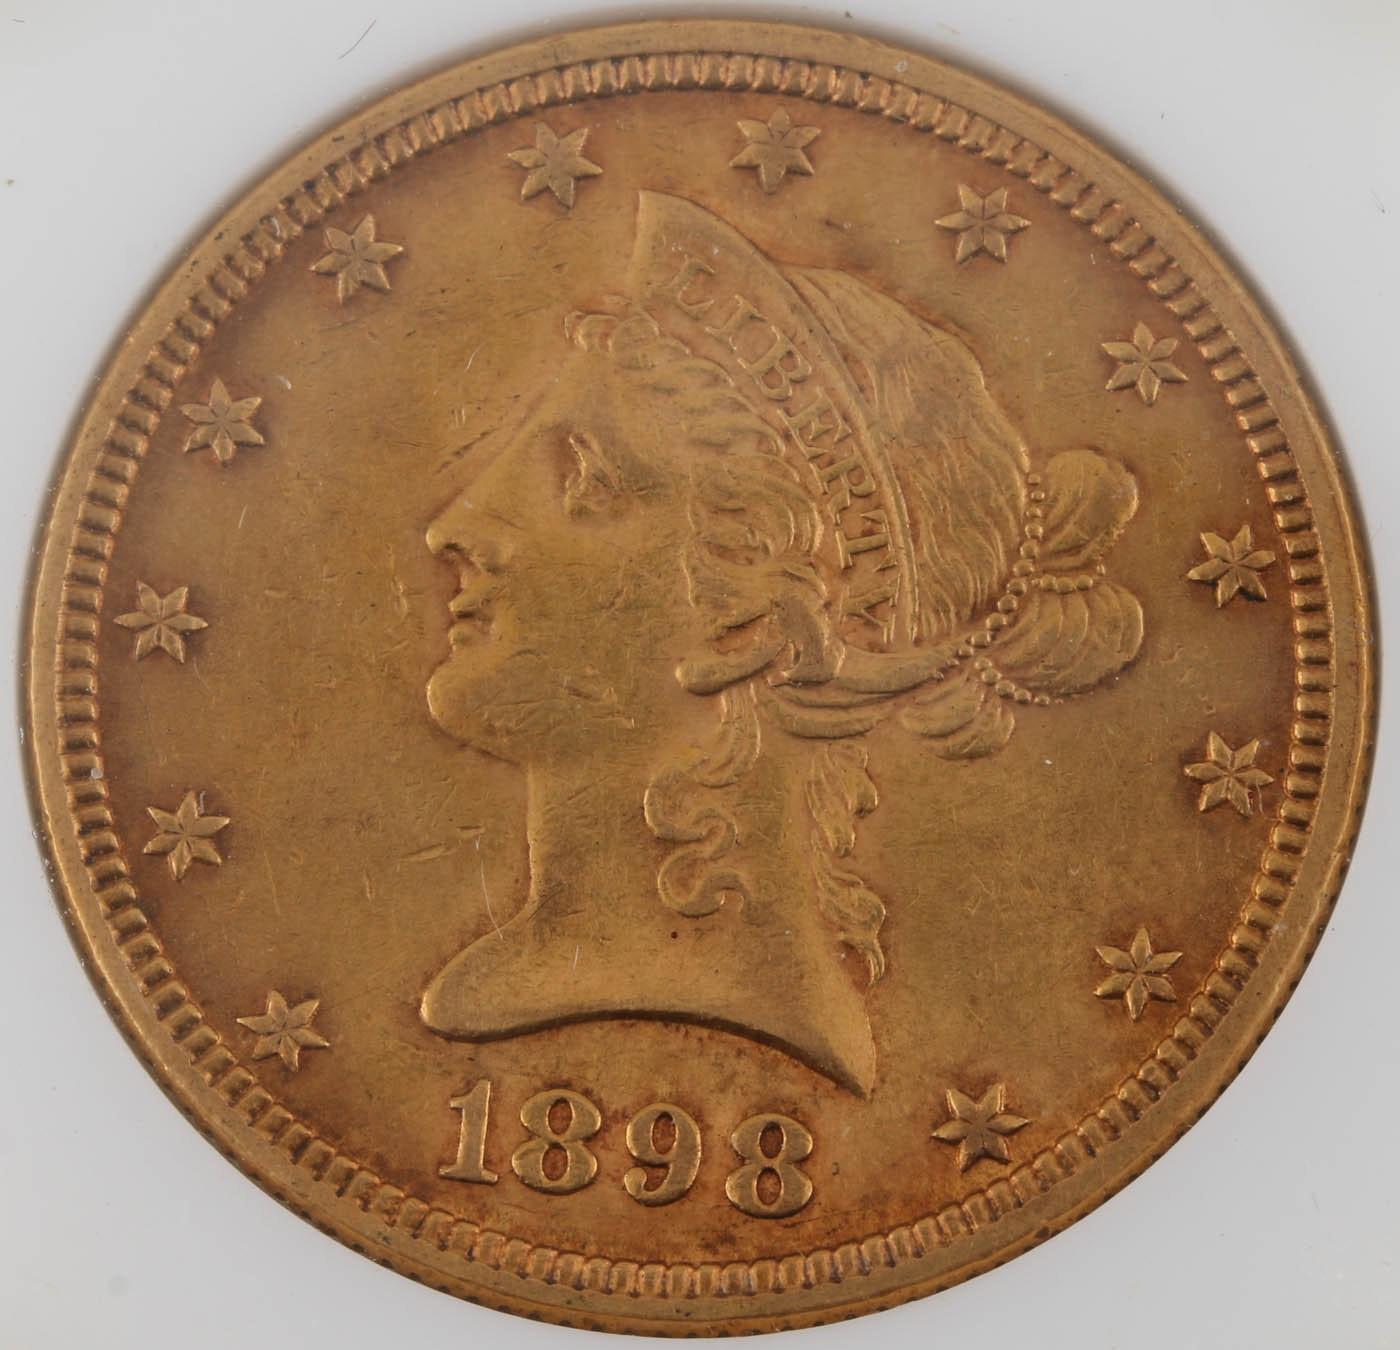 1898 Liberty Head $10 Gold Coin